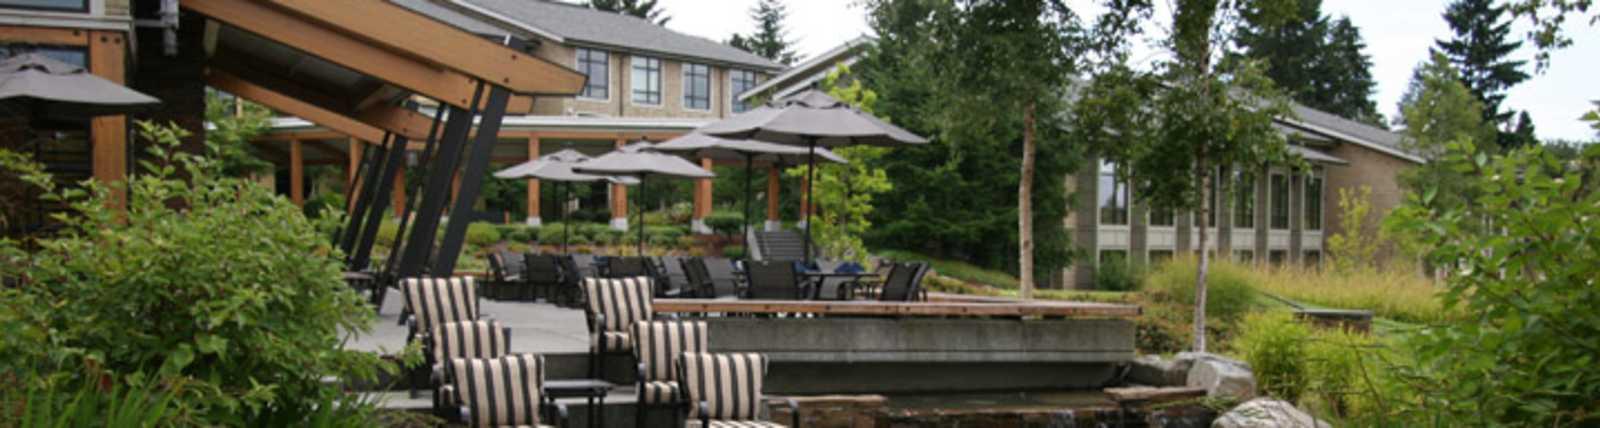 Cedarbrook_Lodge.jpg